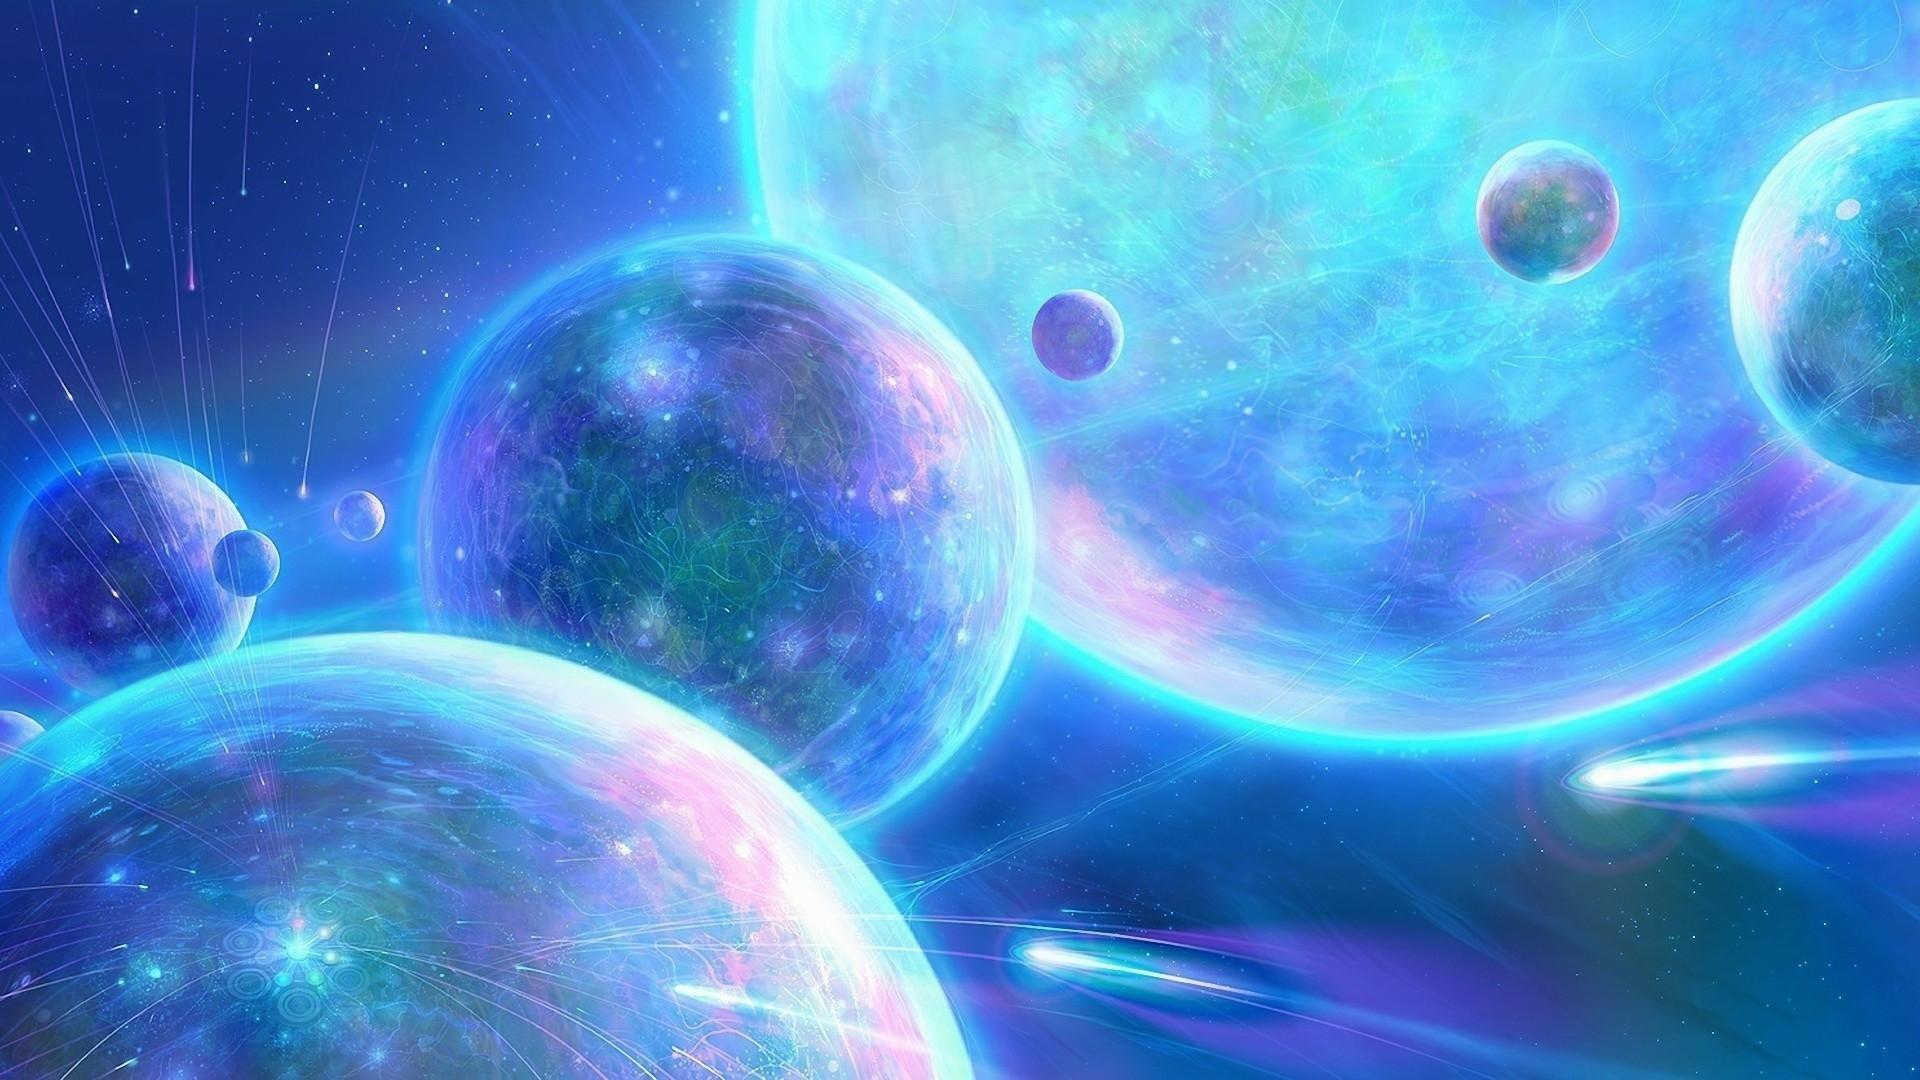 Description Download Beautiful Universe Digital Wallpaper